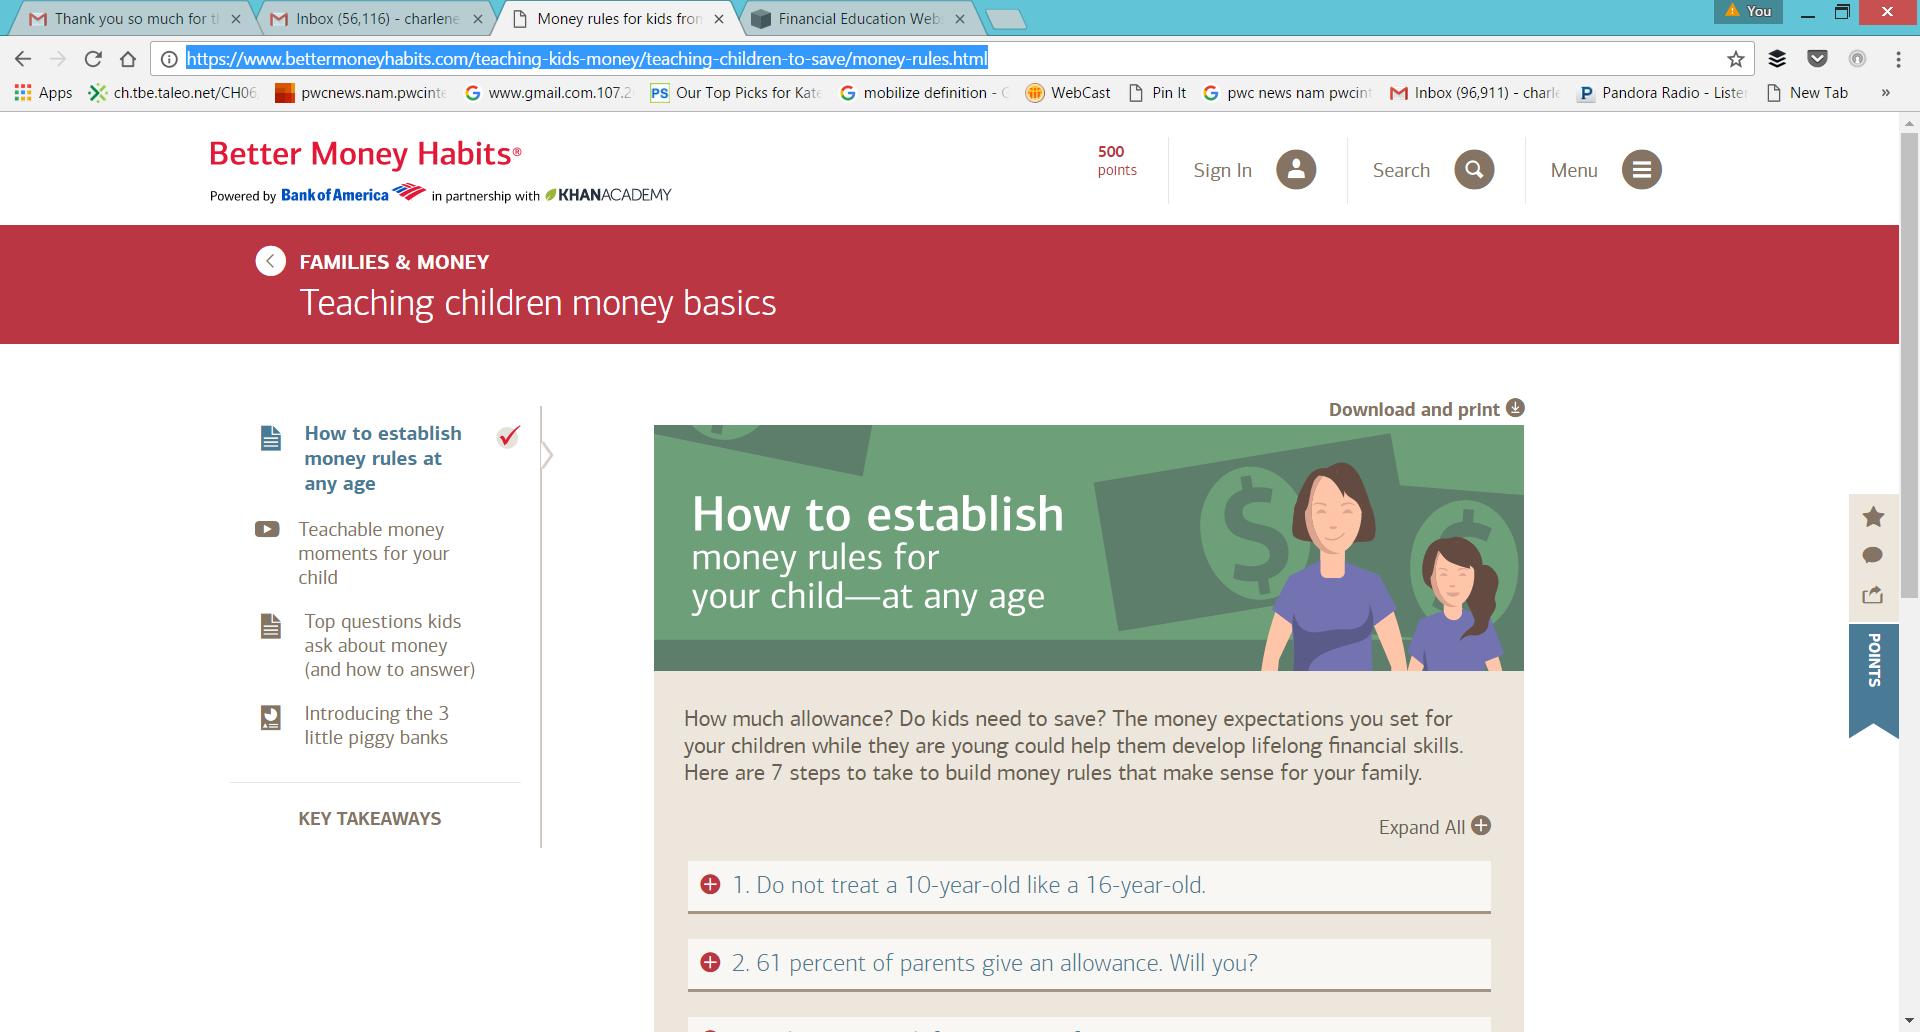 Consumer Financial Protection Bureau's Site